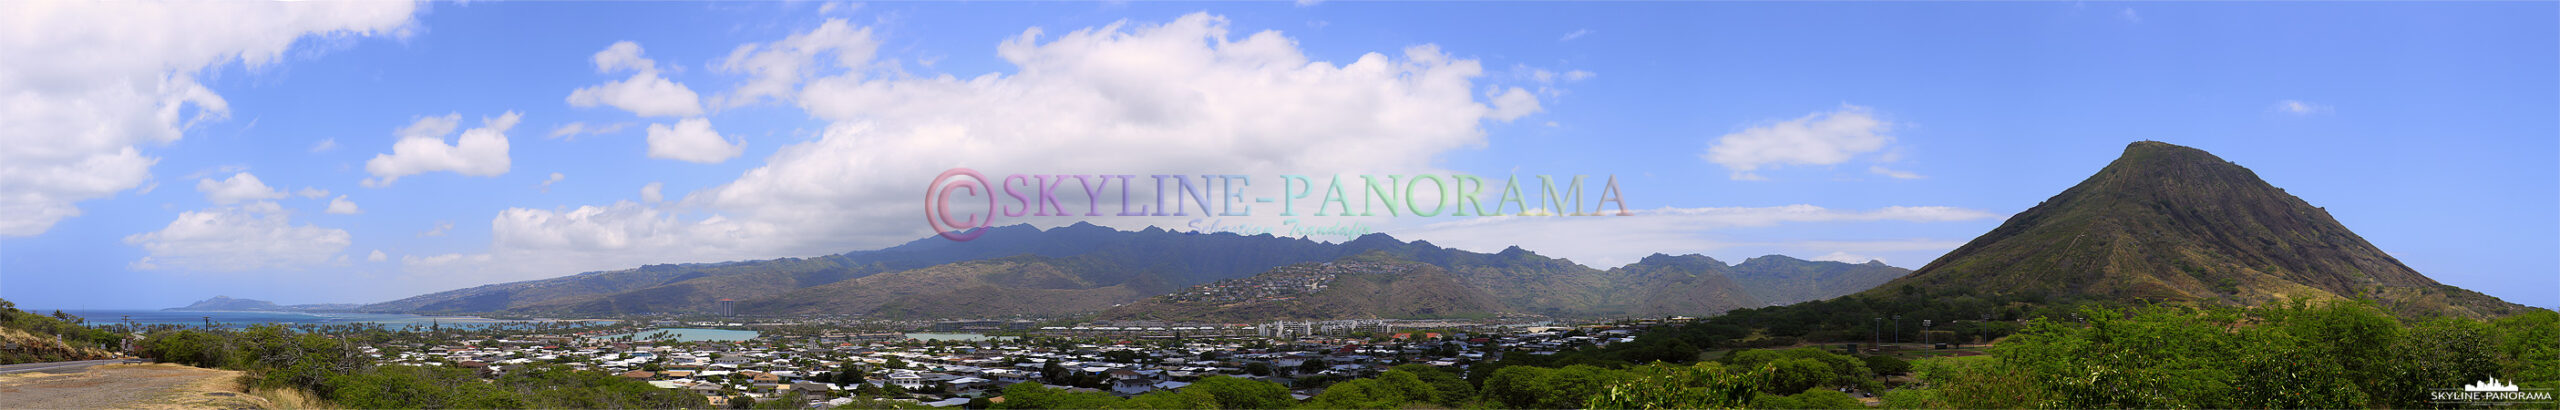 Bilder aus Hawaii - Das Panorama zeigt den Blick über den Ort Hawaii Kai zum bekannten Koko Head Krater von O´ahu Hawaii.